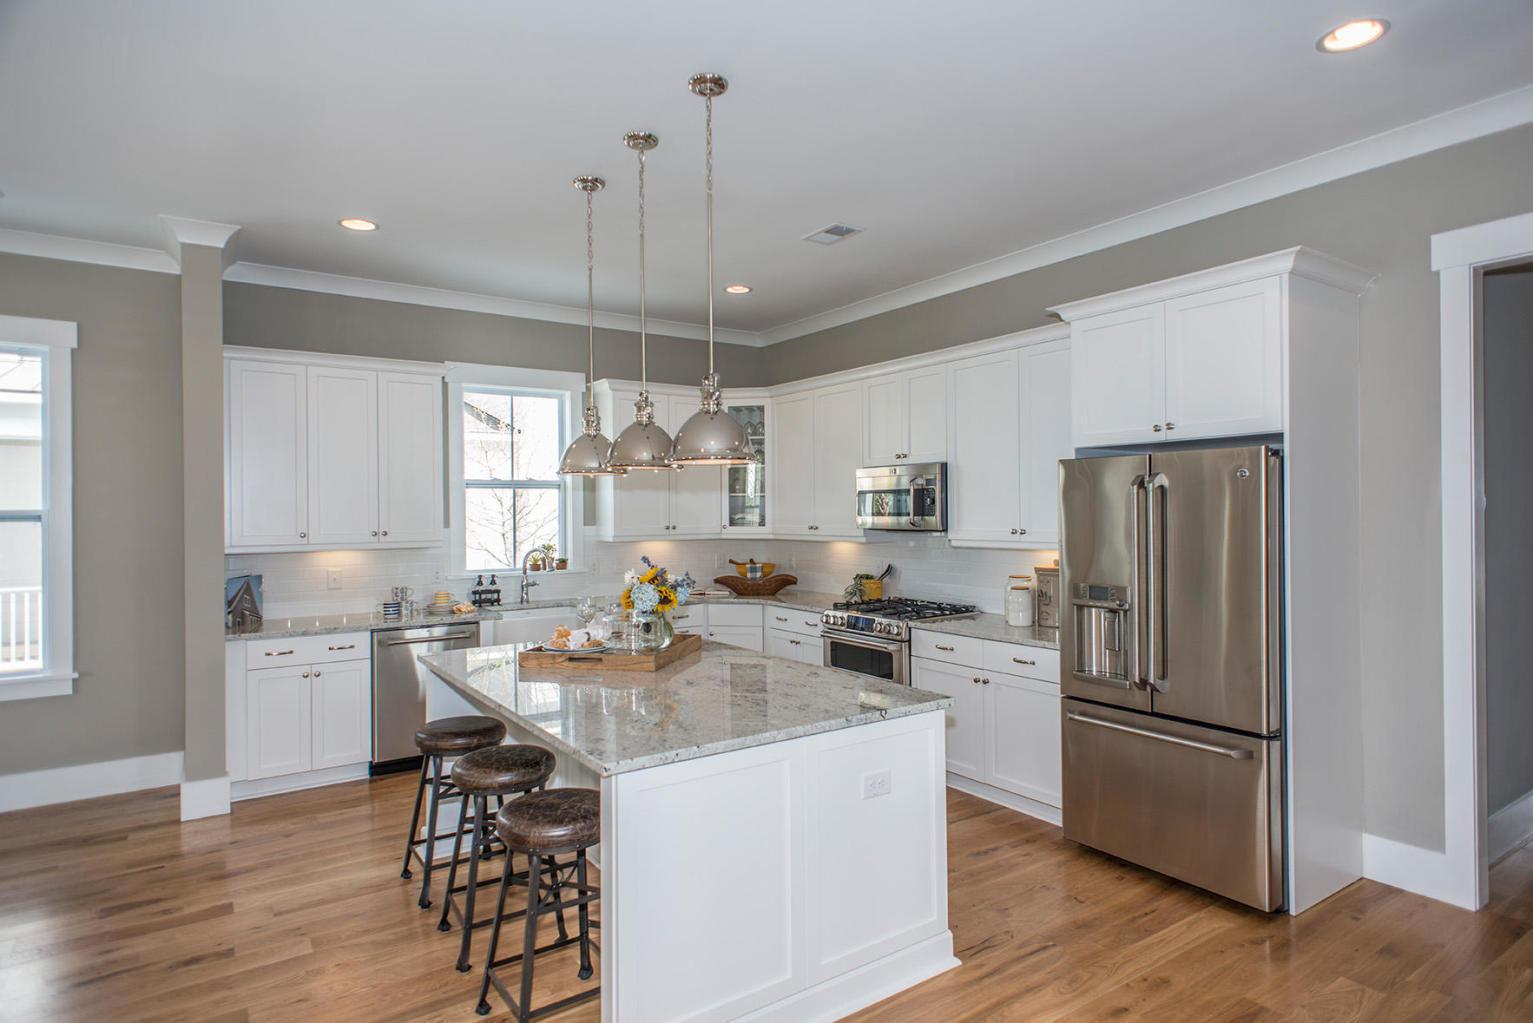 Carolina Park Homes For Sale - 1534 Banning, Mount Pleasant, SC - 17